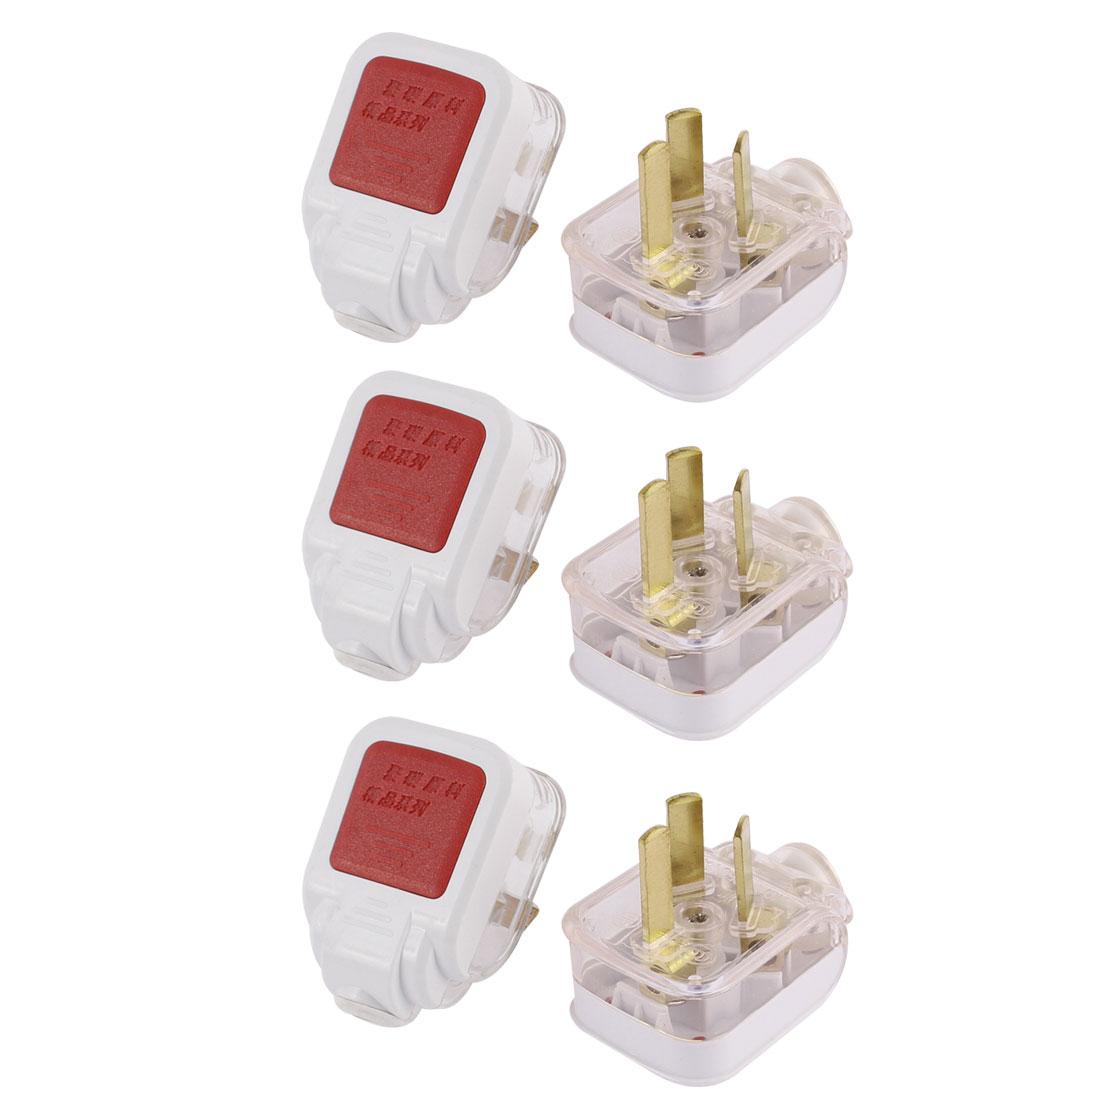 AU Plug AC 250V 10A Rewirable Power Cord Connector Adapter 6Pcs